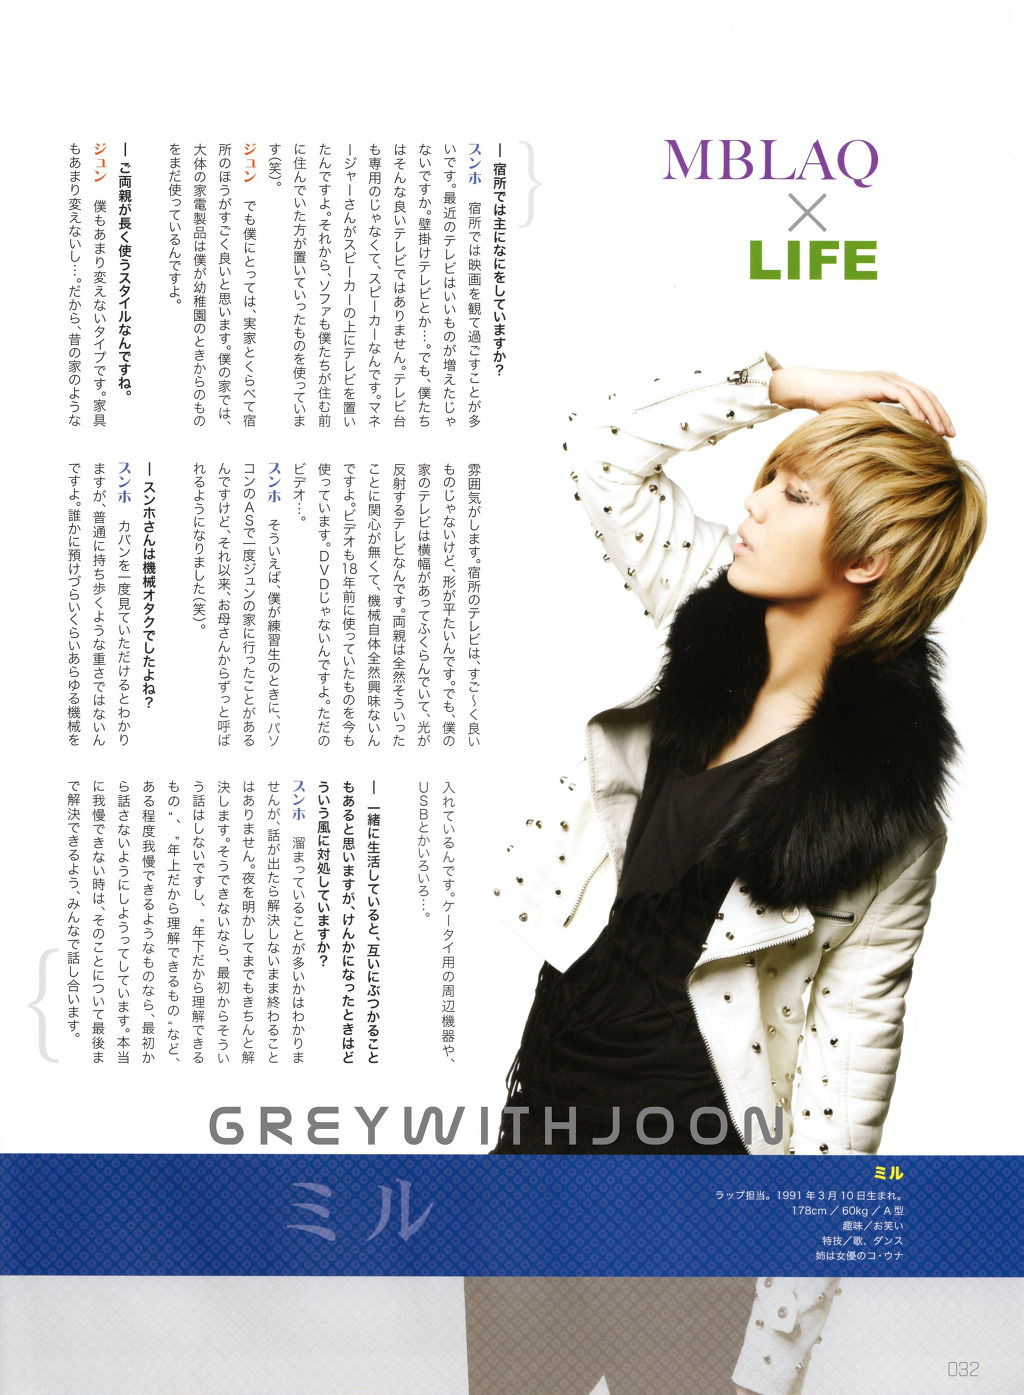 [01.03.11]MBLAQ @ CREA STAR Scan11